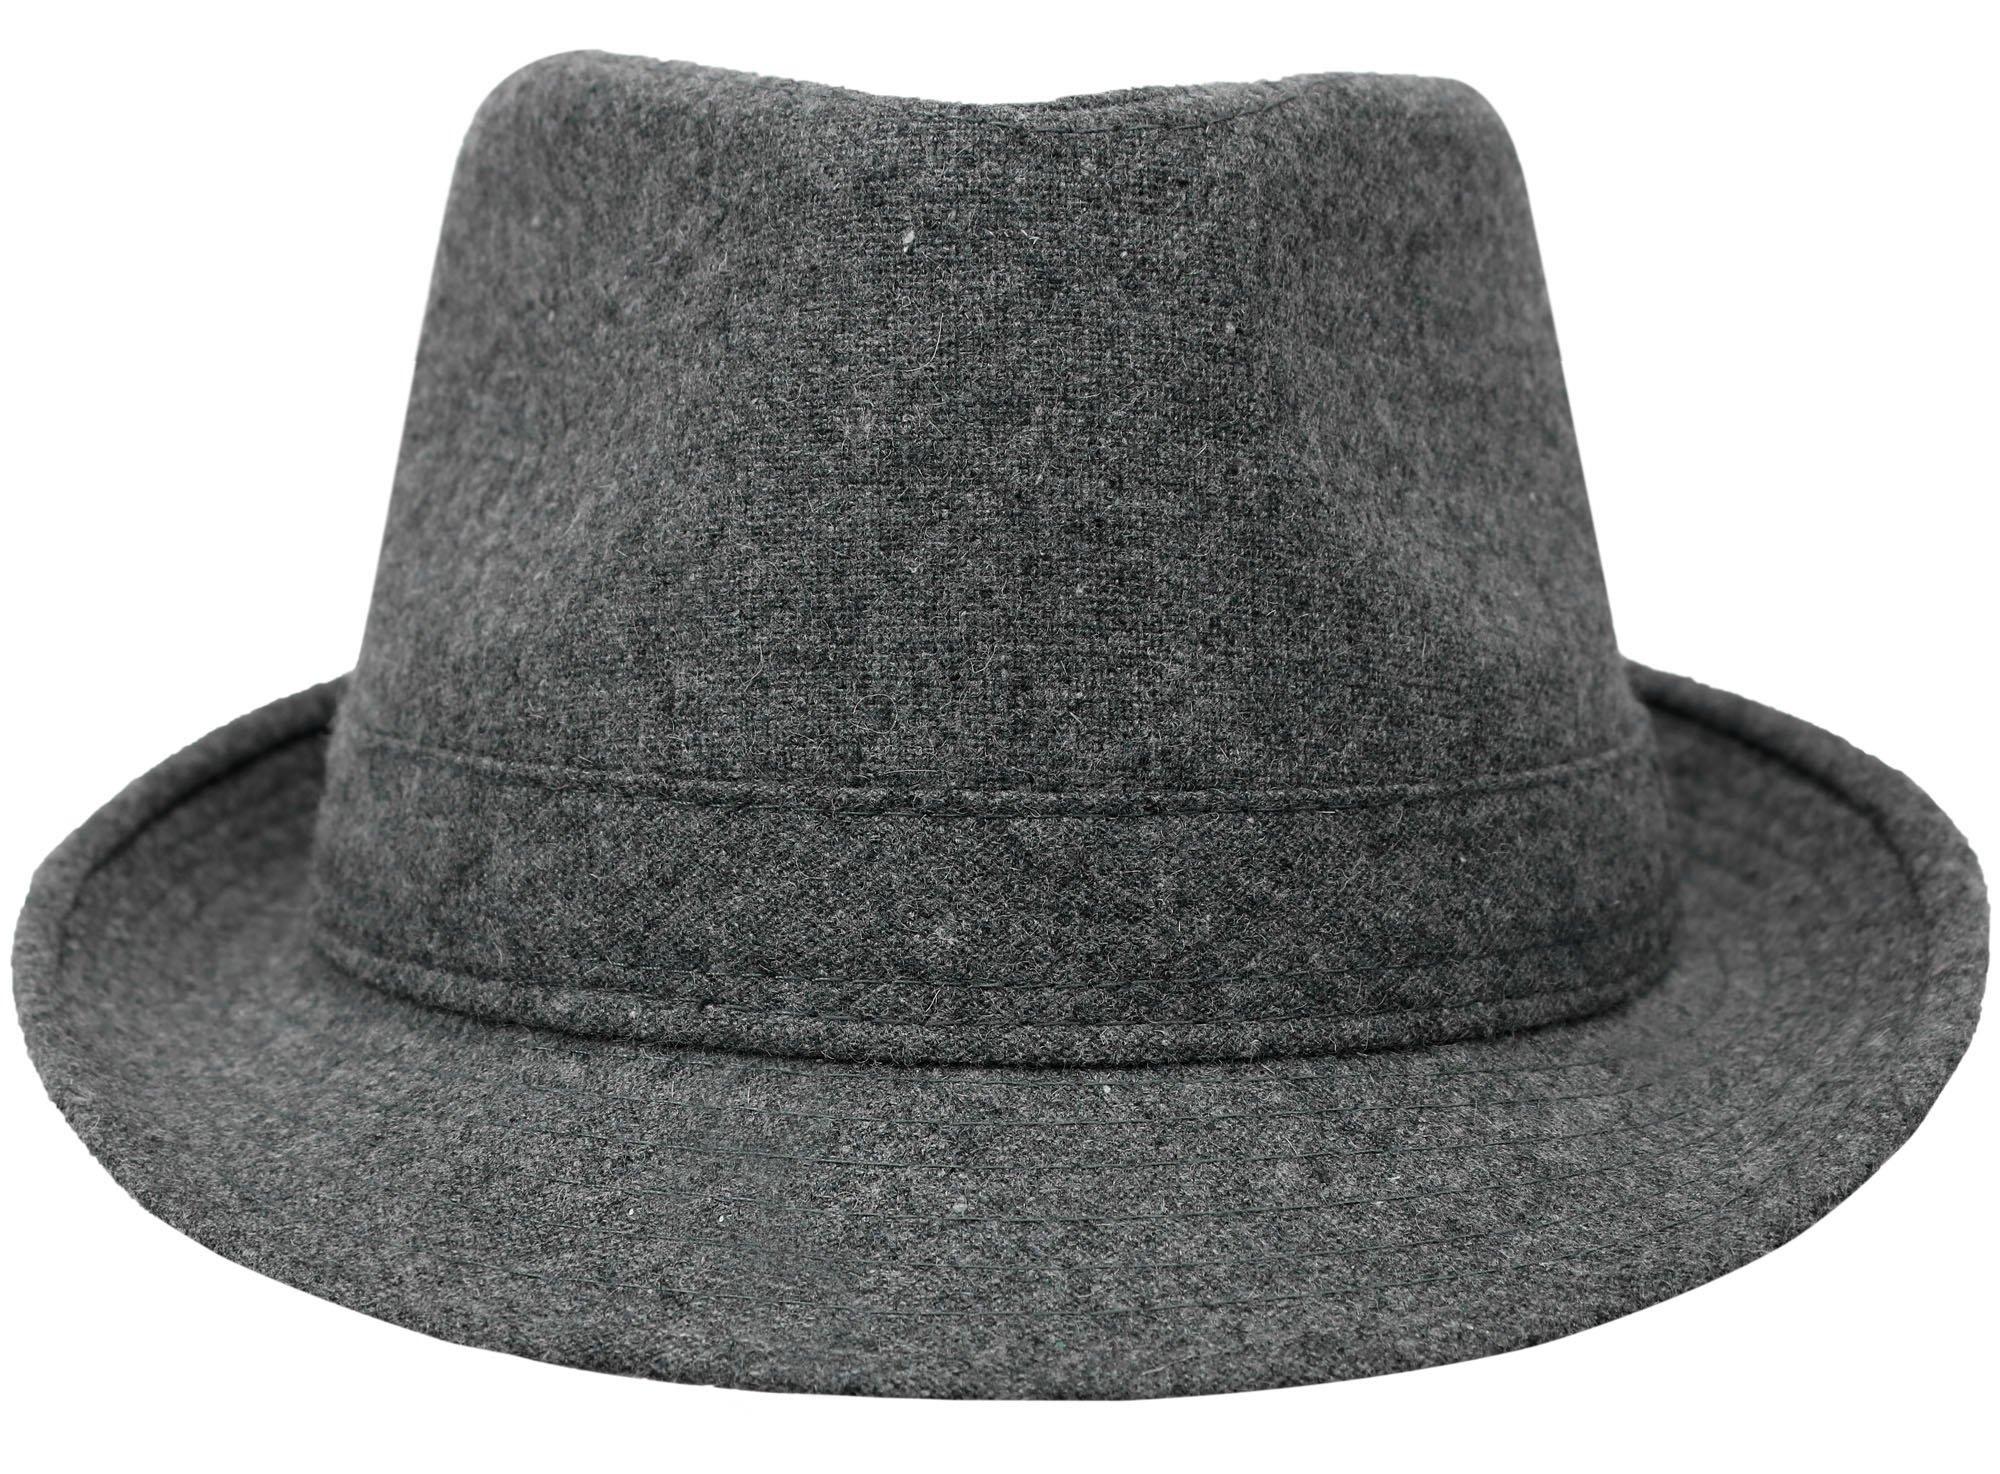 Unisex Short Brim Wool Blend Classic Manhattan Fedora Hat, Grey